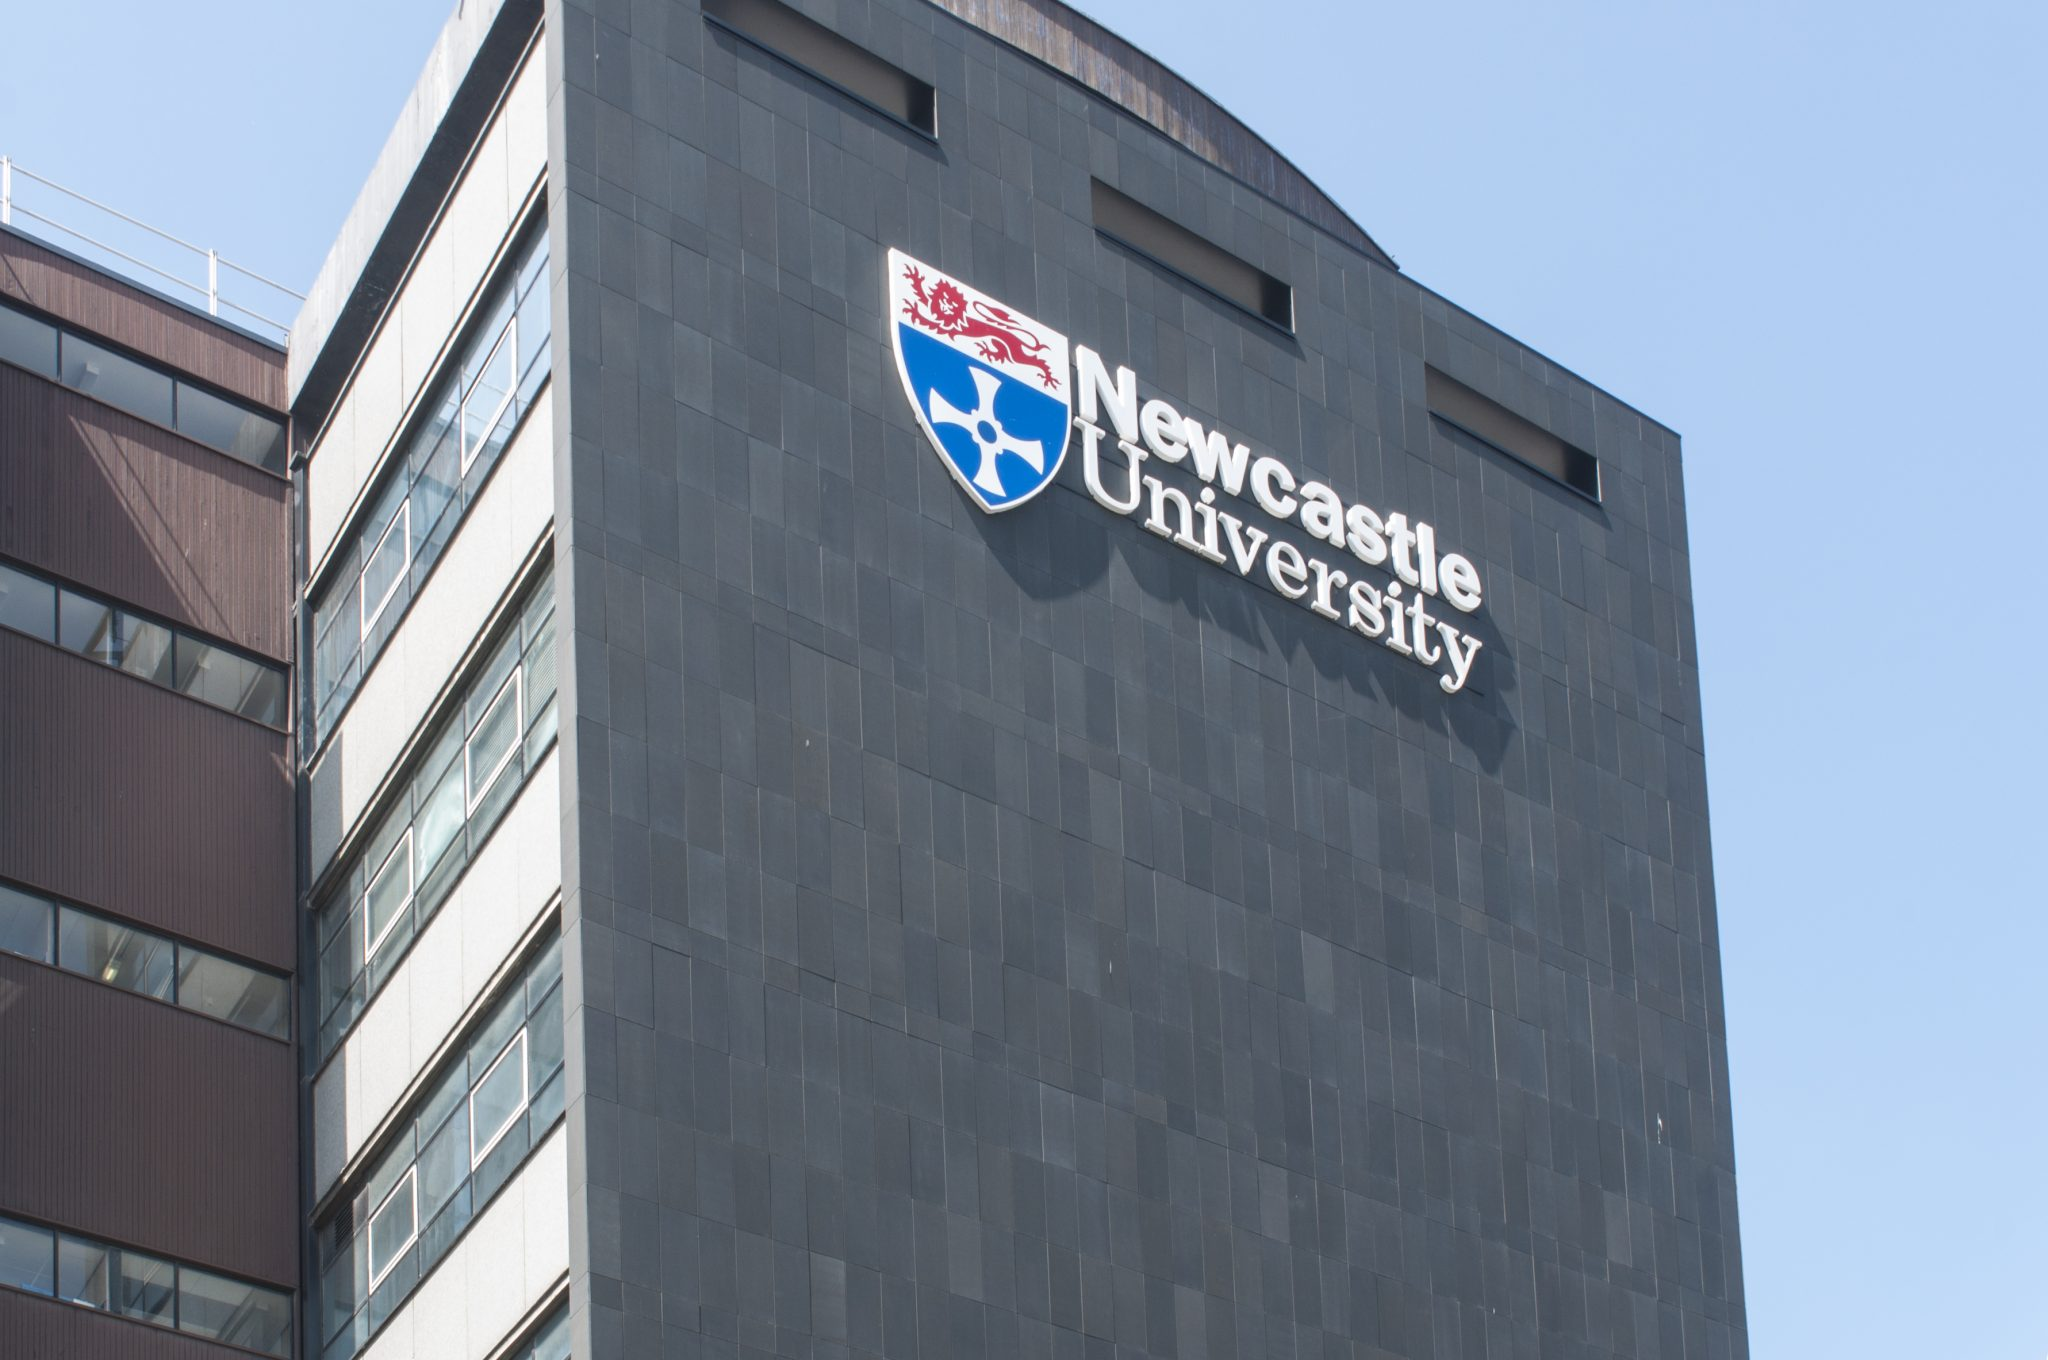 Aerolite Granite Hershel Building Newcastle (4)